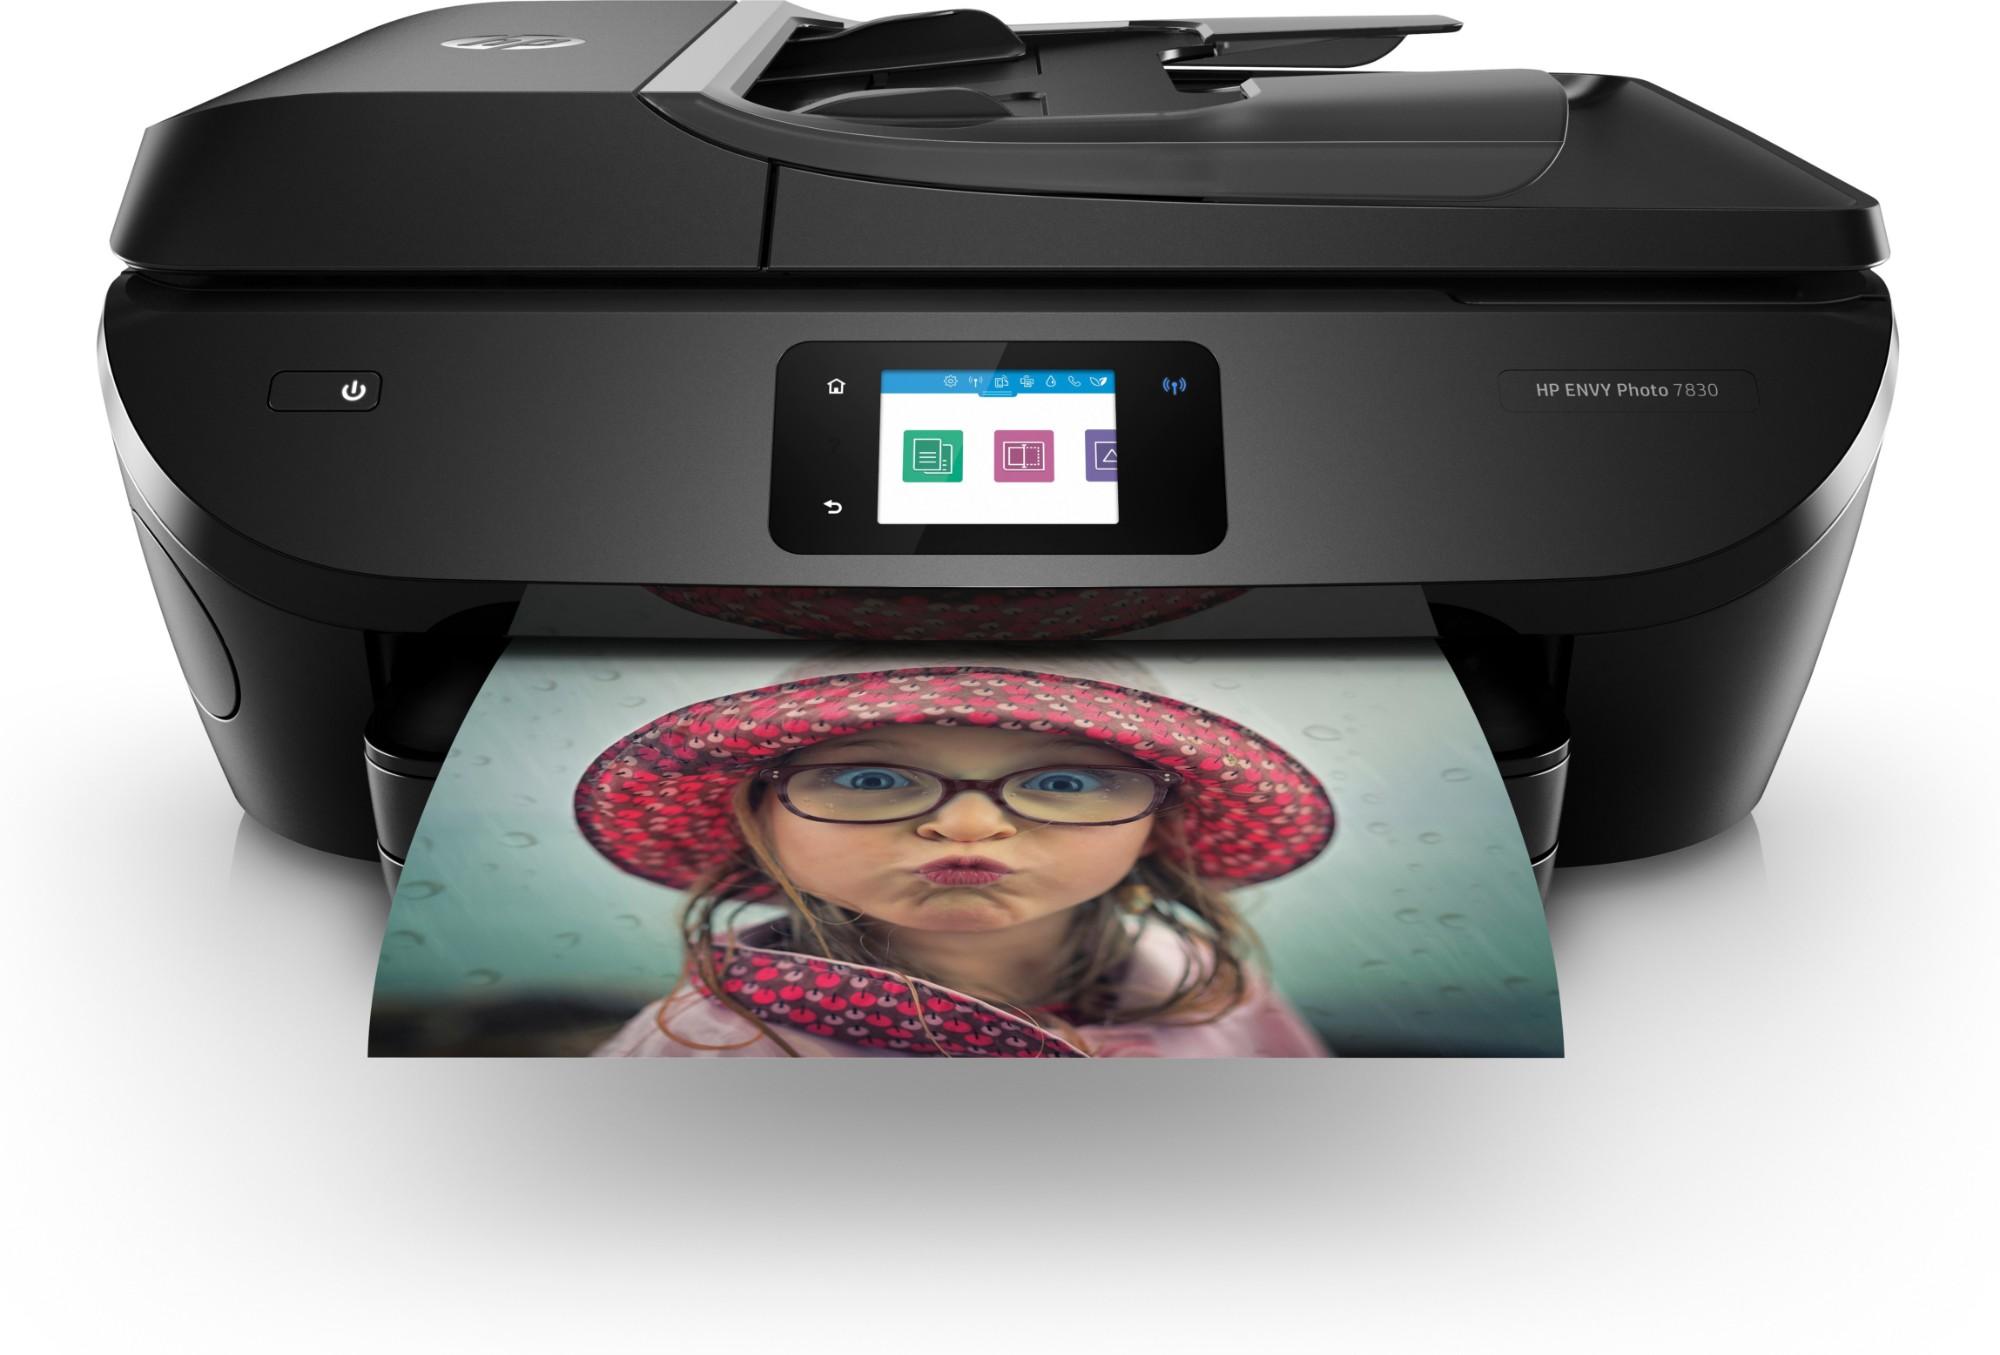 HP ENVY Photo 7830 Inyección de tinta térmica 15 ppm 4800 x 1200 DPI A4 Wifi